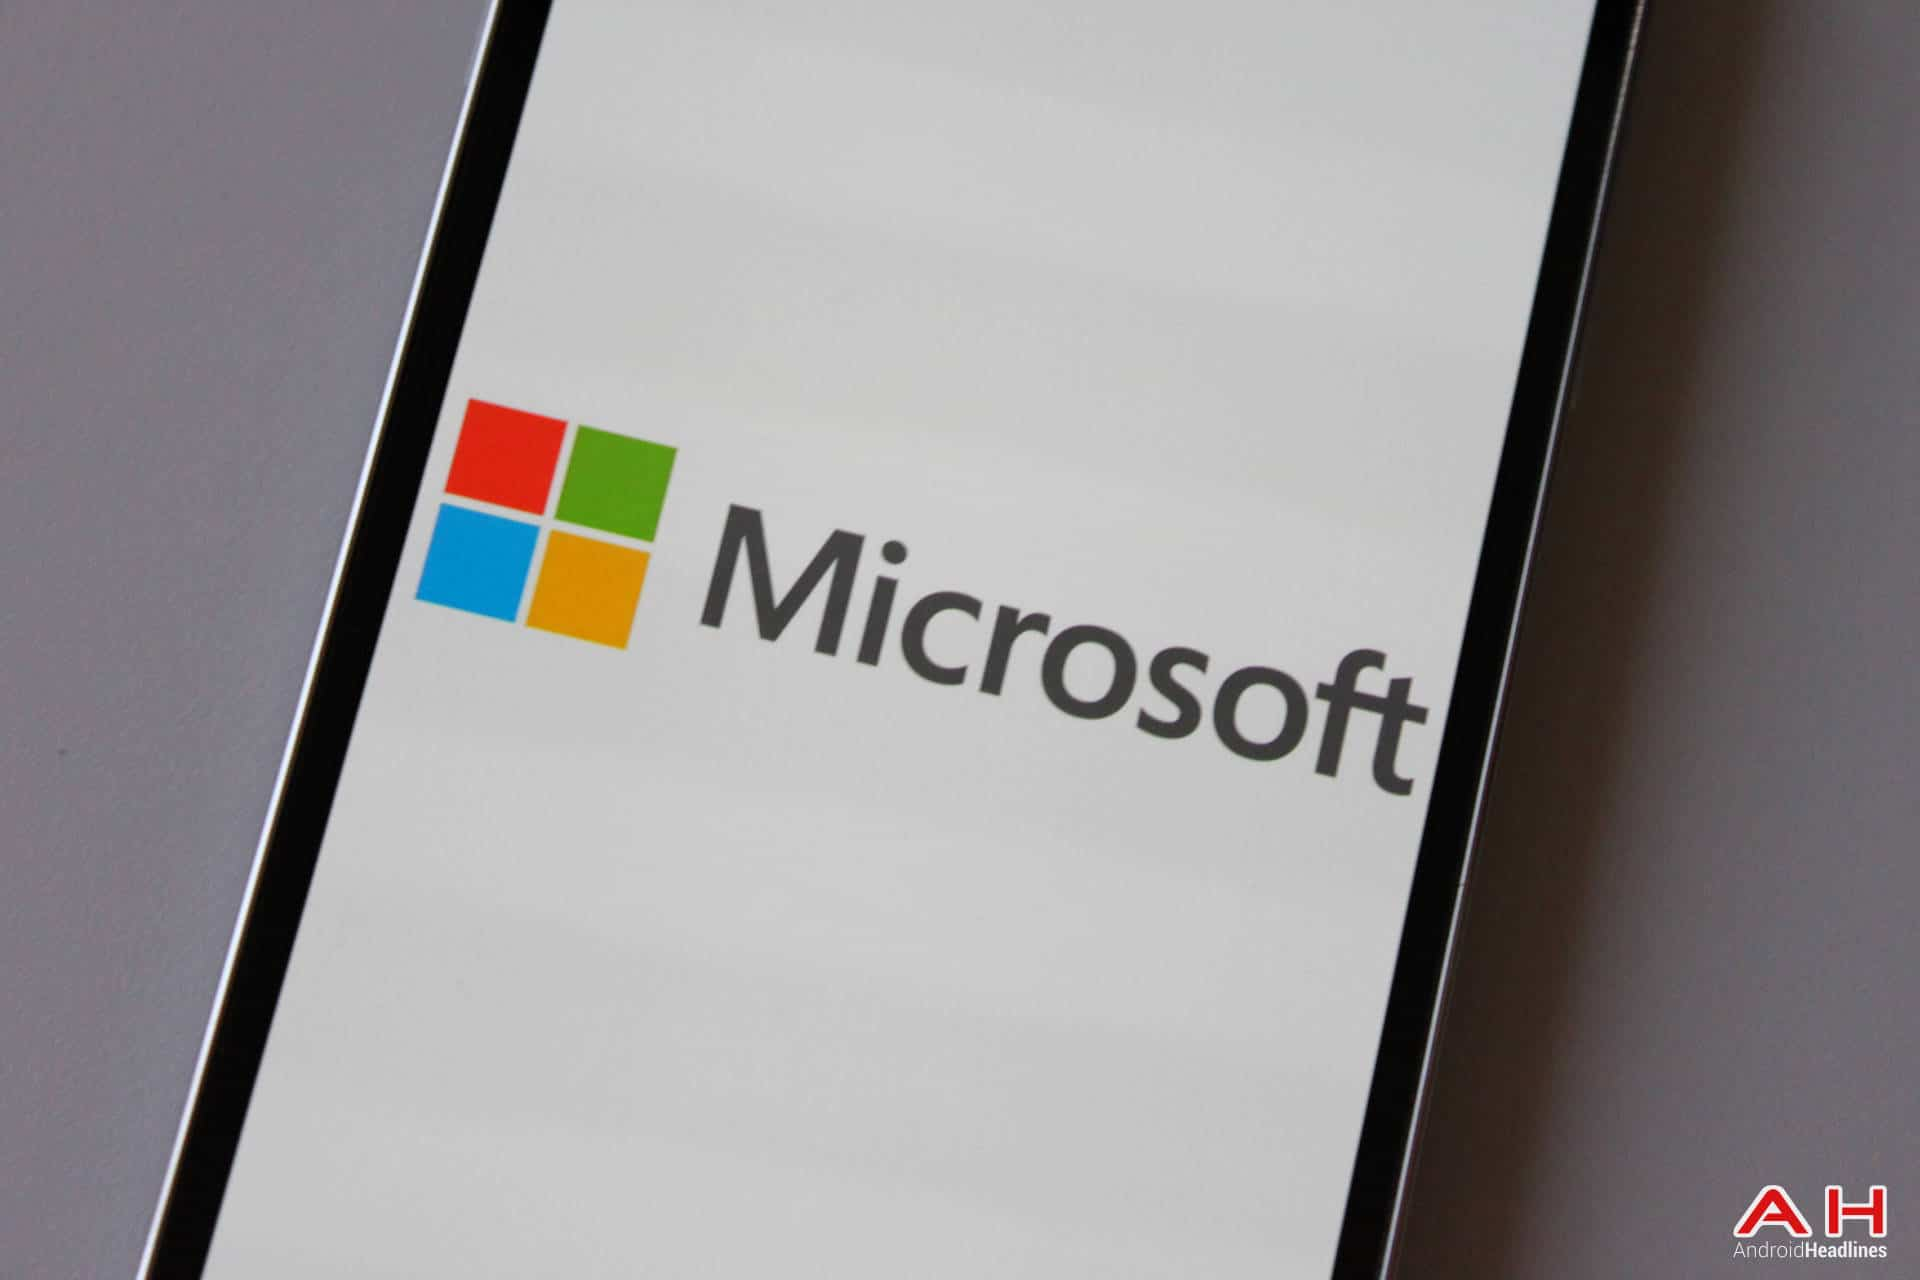 AH Microsoft Logo 1.1